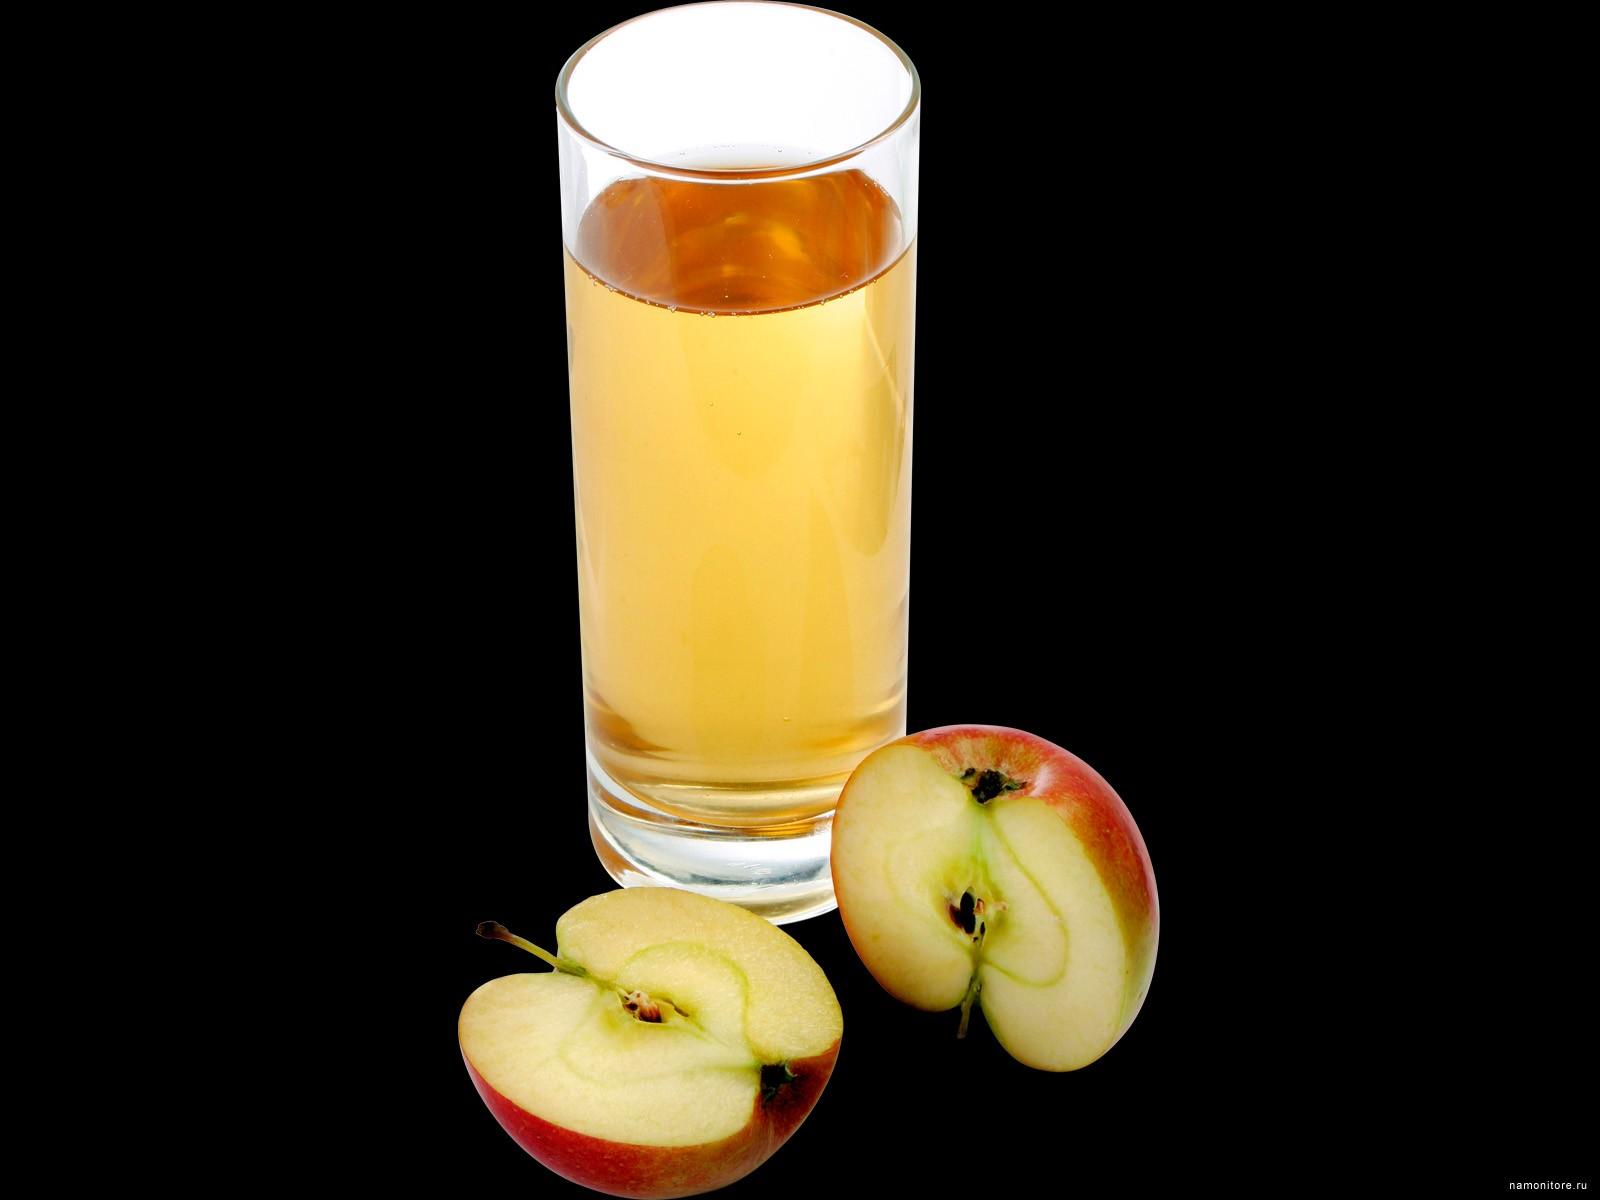 картинка сока яблочного тоже постоянно задаю